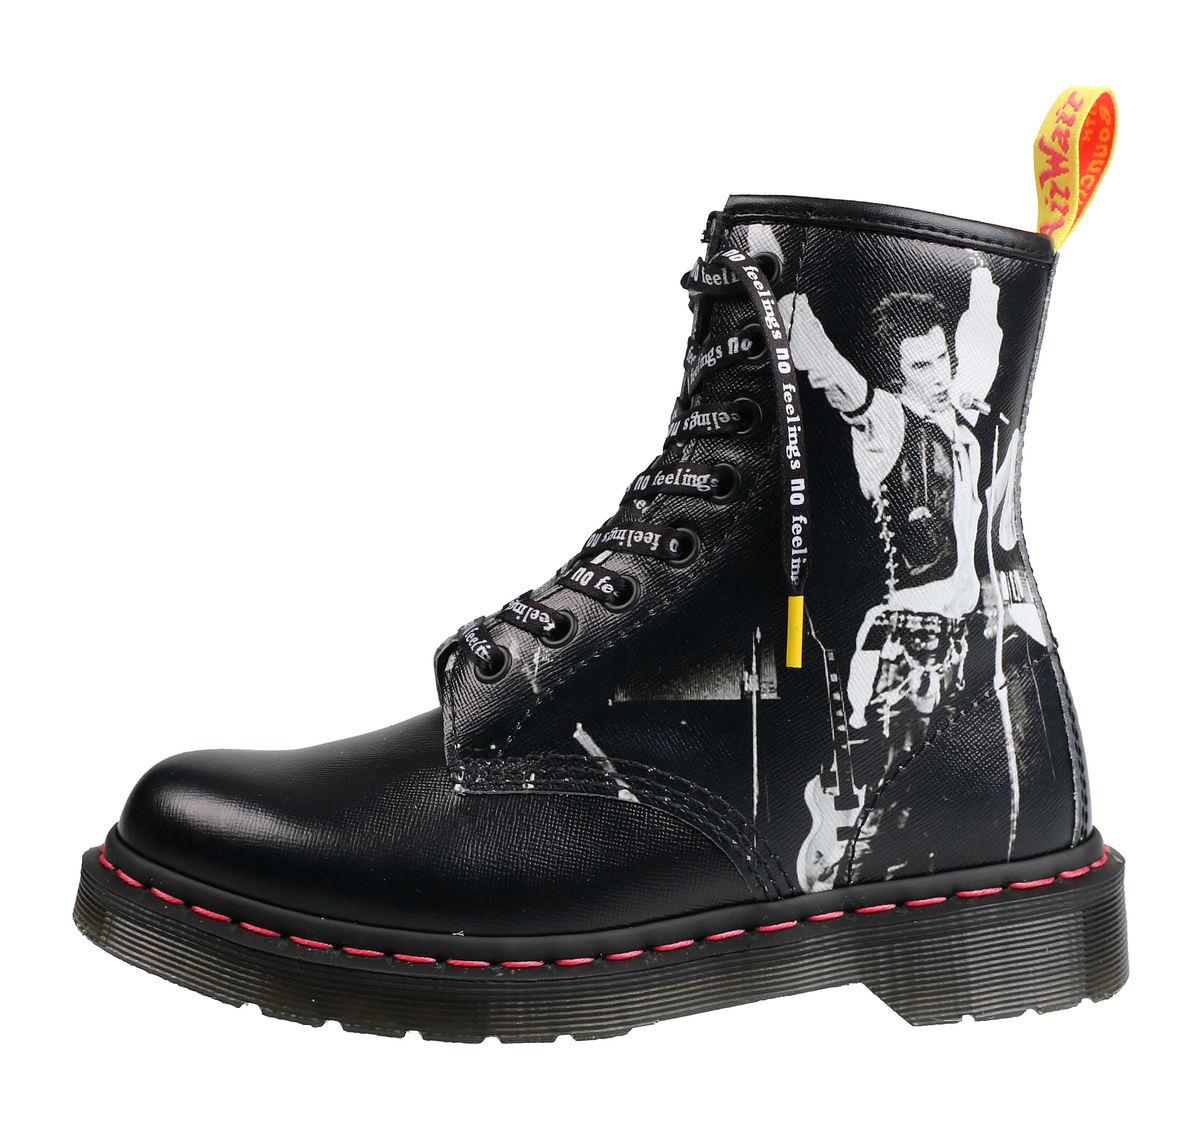 347cef282a657 topánky DR.MARTENS - 8 dierkové - Sex Pistols - backhand straw obilie -  DM24789001